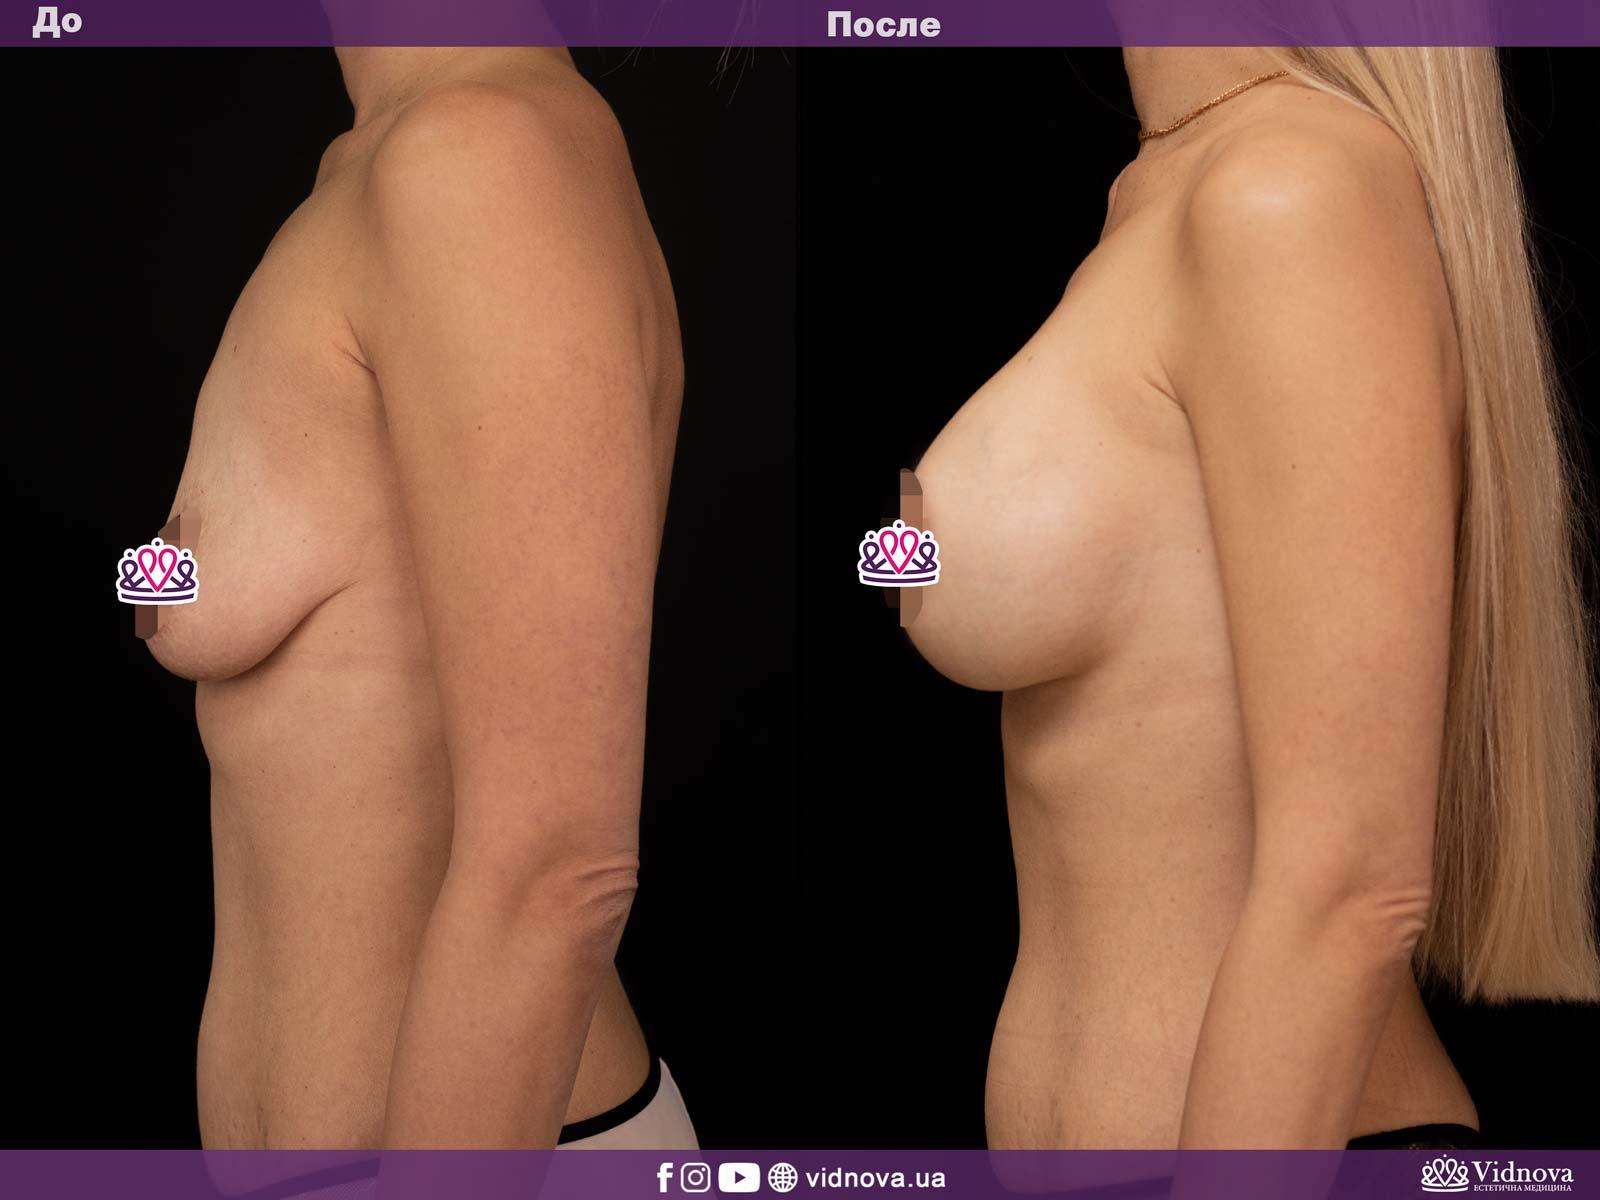 Подтяжка груди: Фото ДО и ПОСЛЕ - Пример №2-3 - Клиника Vidnova